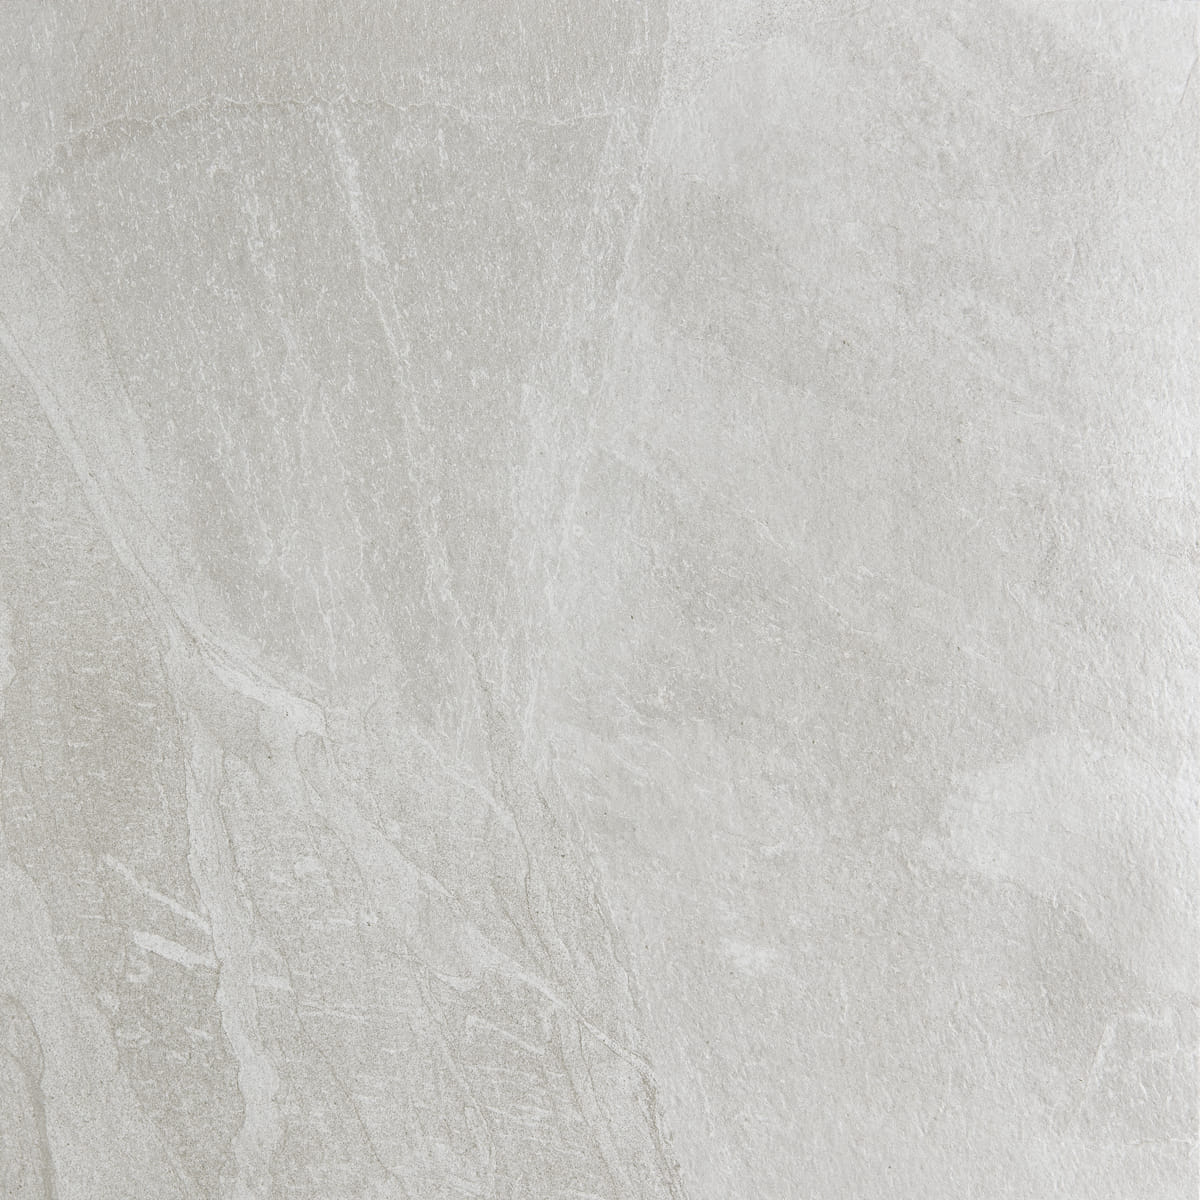 FOTO 2 sandstone white ant 75x75 1